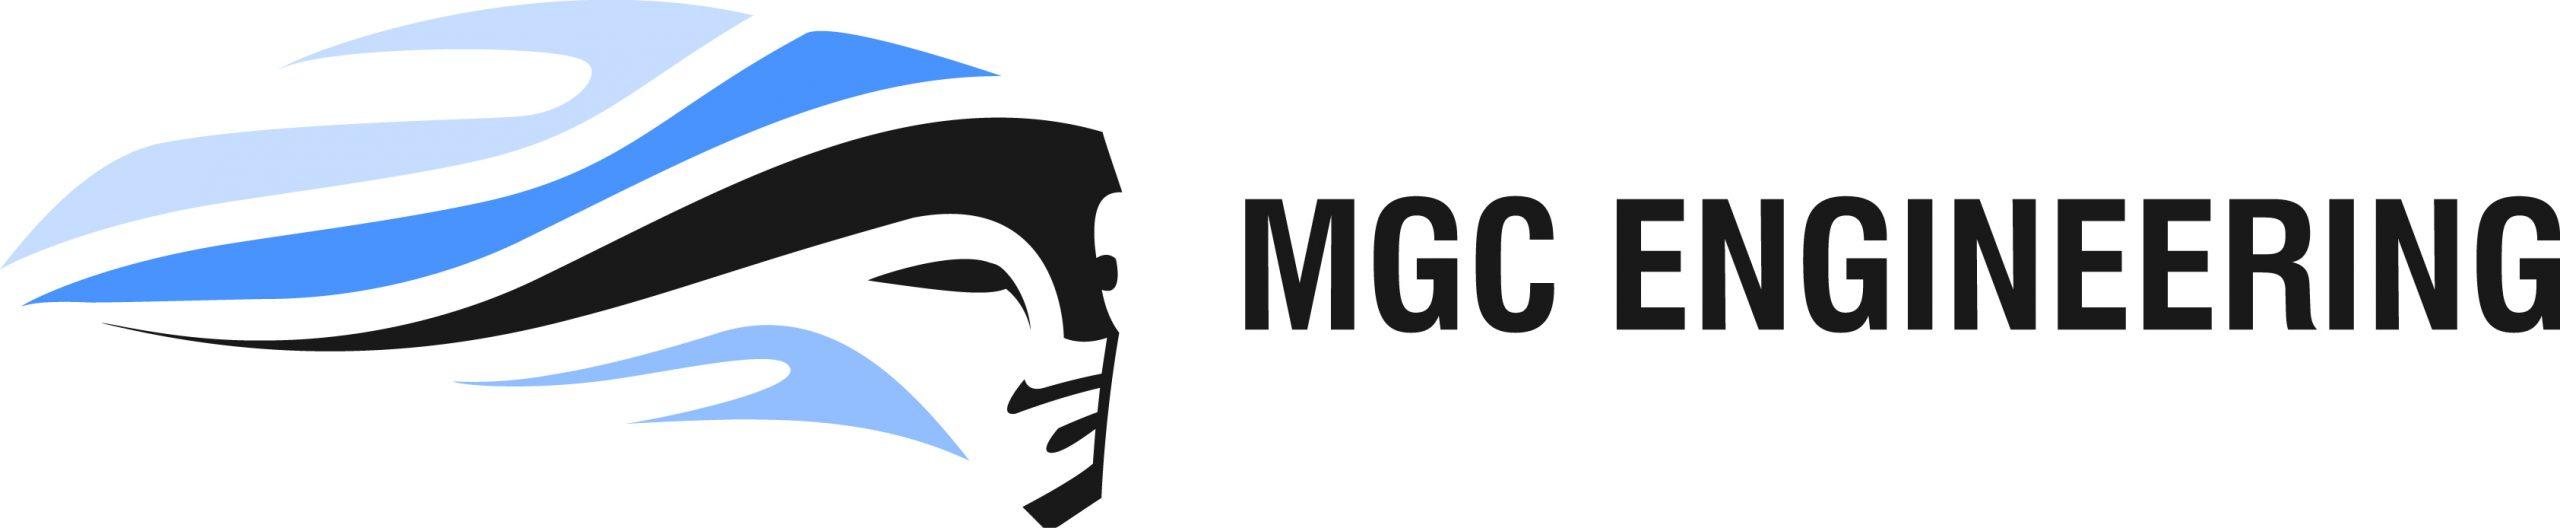 new-mgc-logo-high-quality